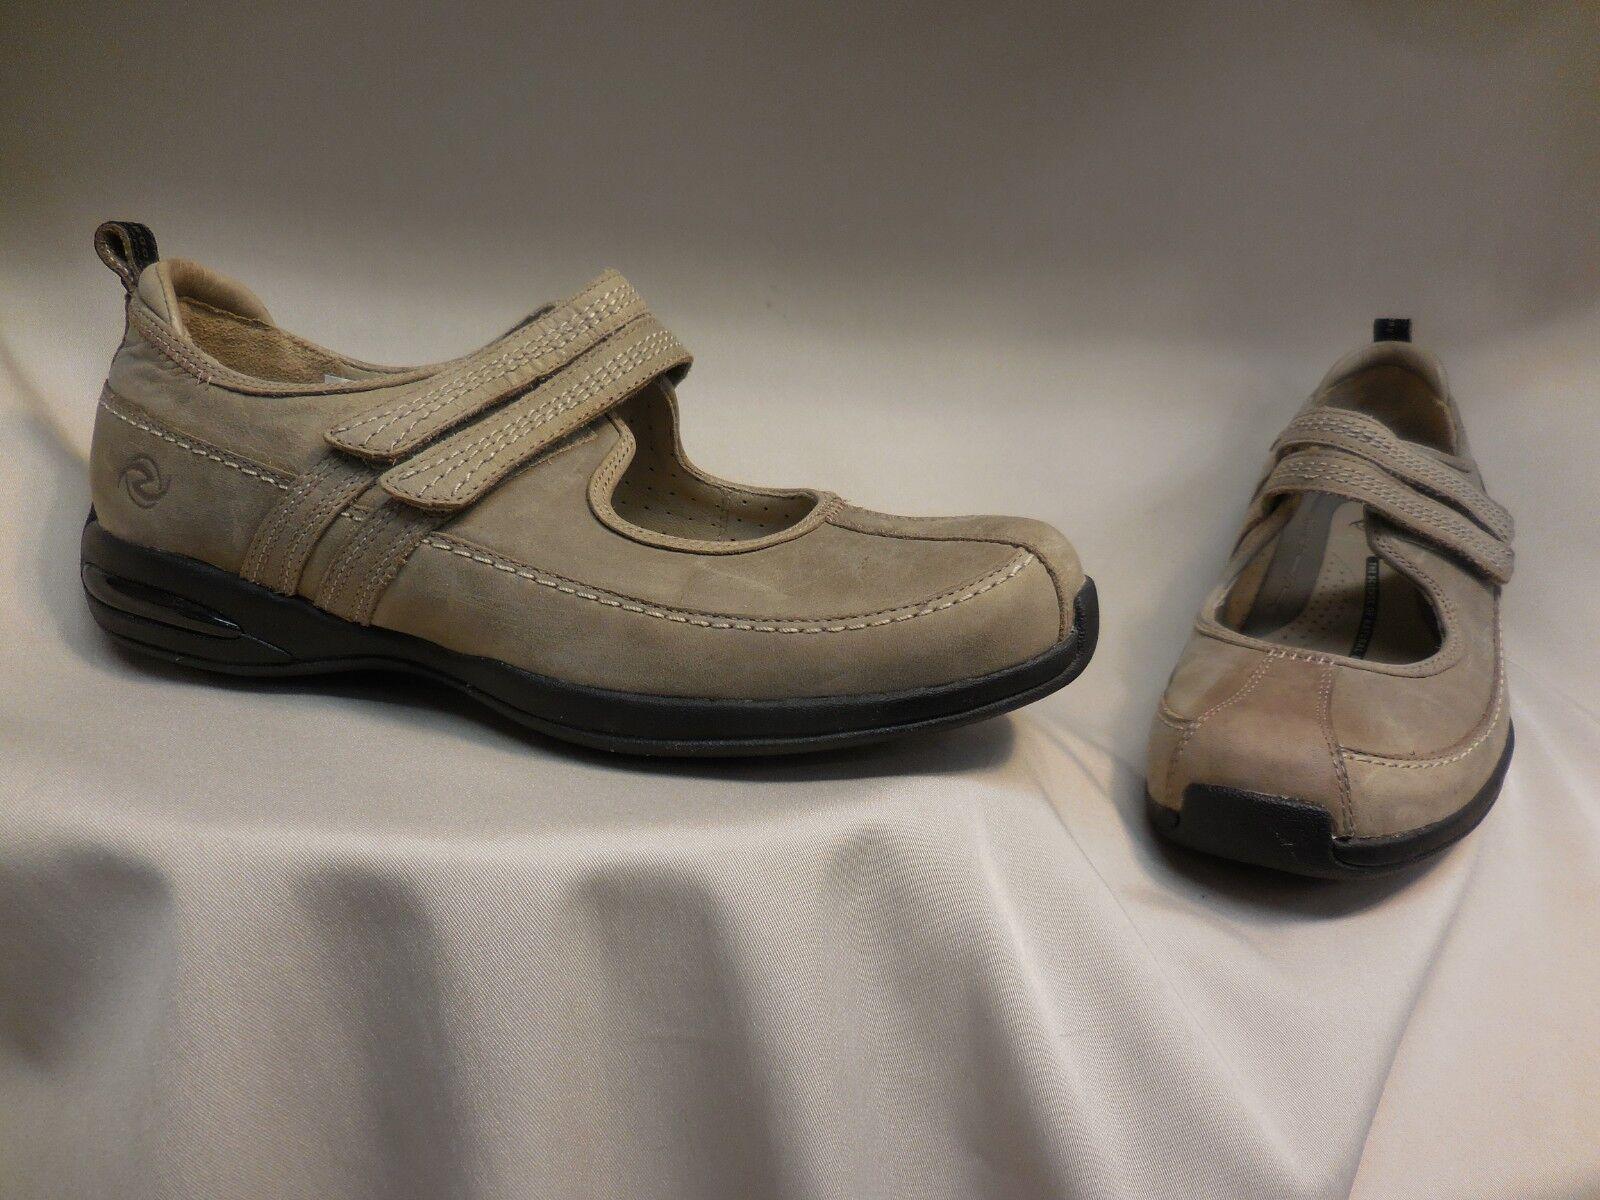 Z7 Serenity Flat Professional Professional Professional Mary Jane Comfort schuhe damen Größe 7 542fa3